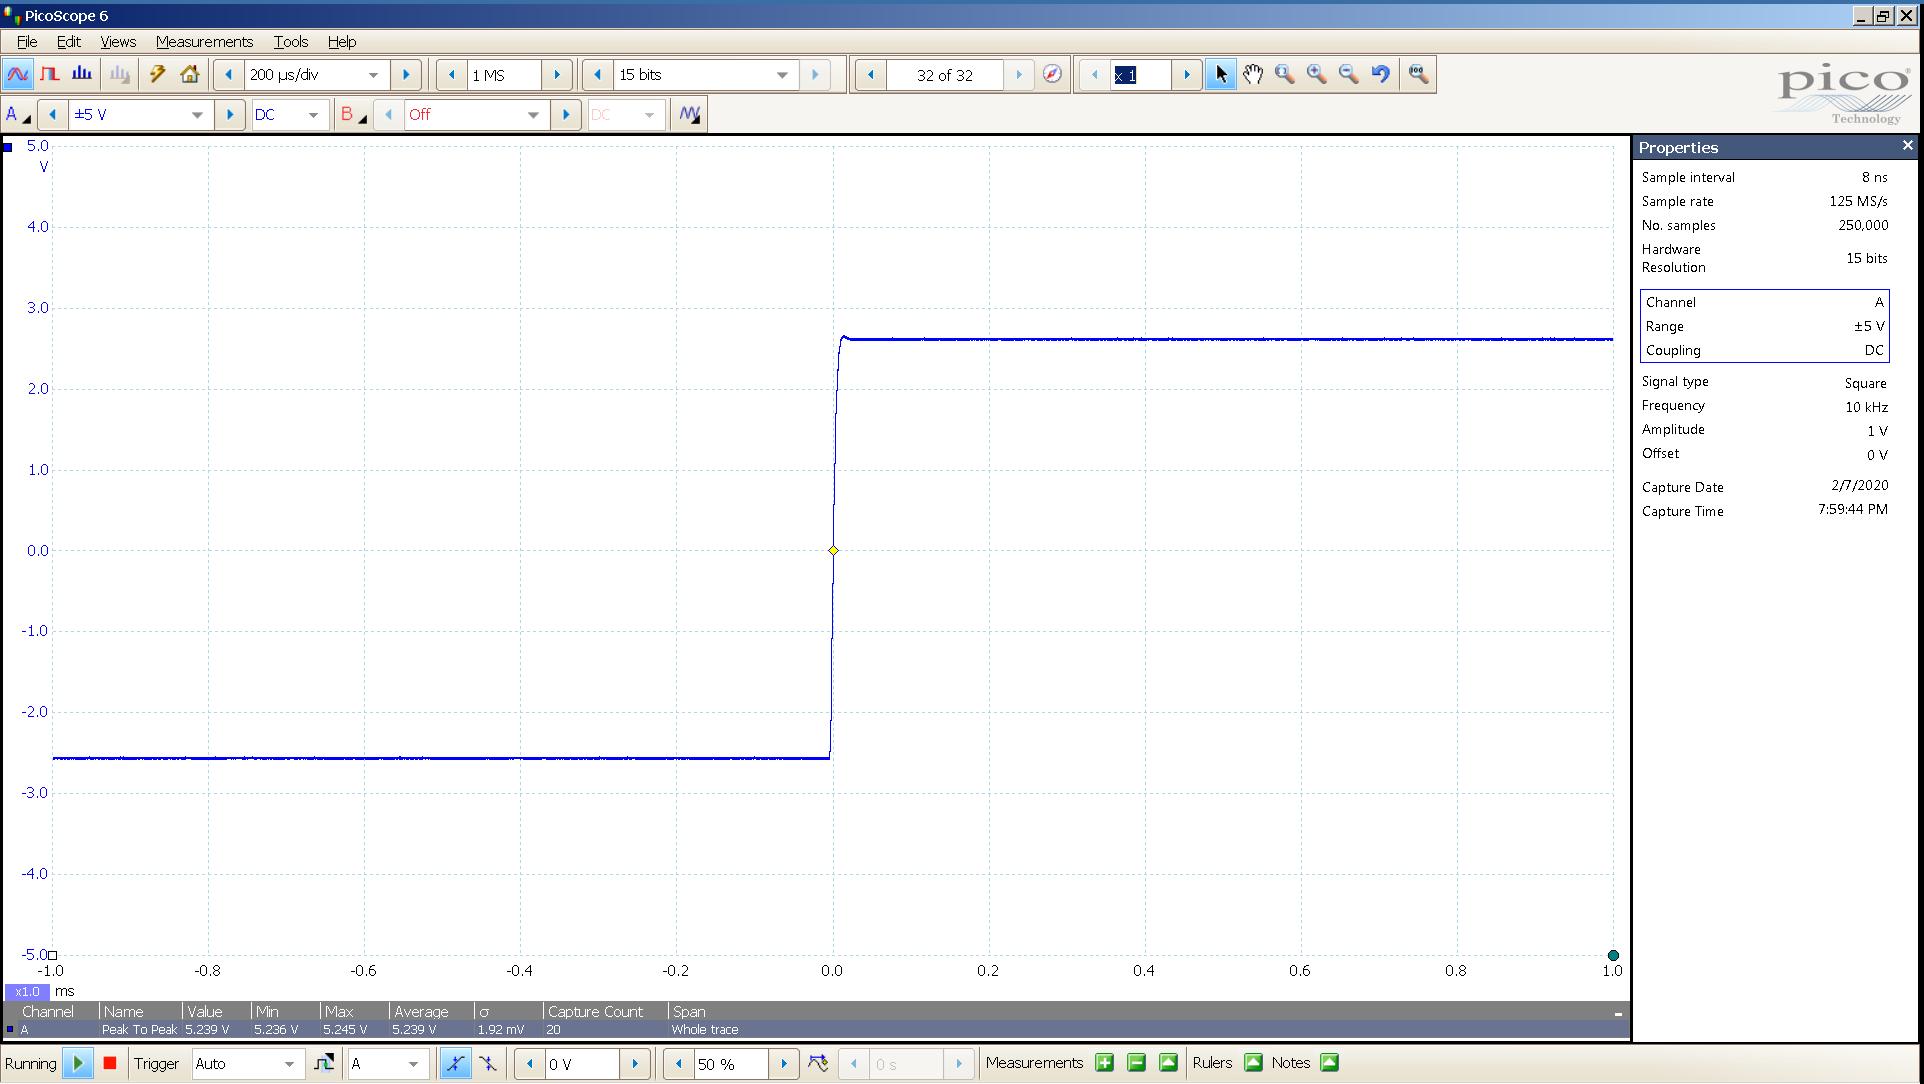 20200207-05 KTE May 20 Hz sqr -4 dBFS 5 Vpp 200uS div SE - ASIO - NOS.png